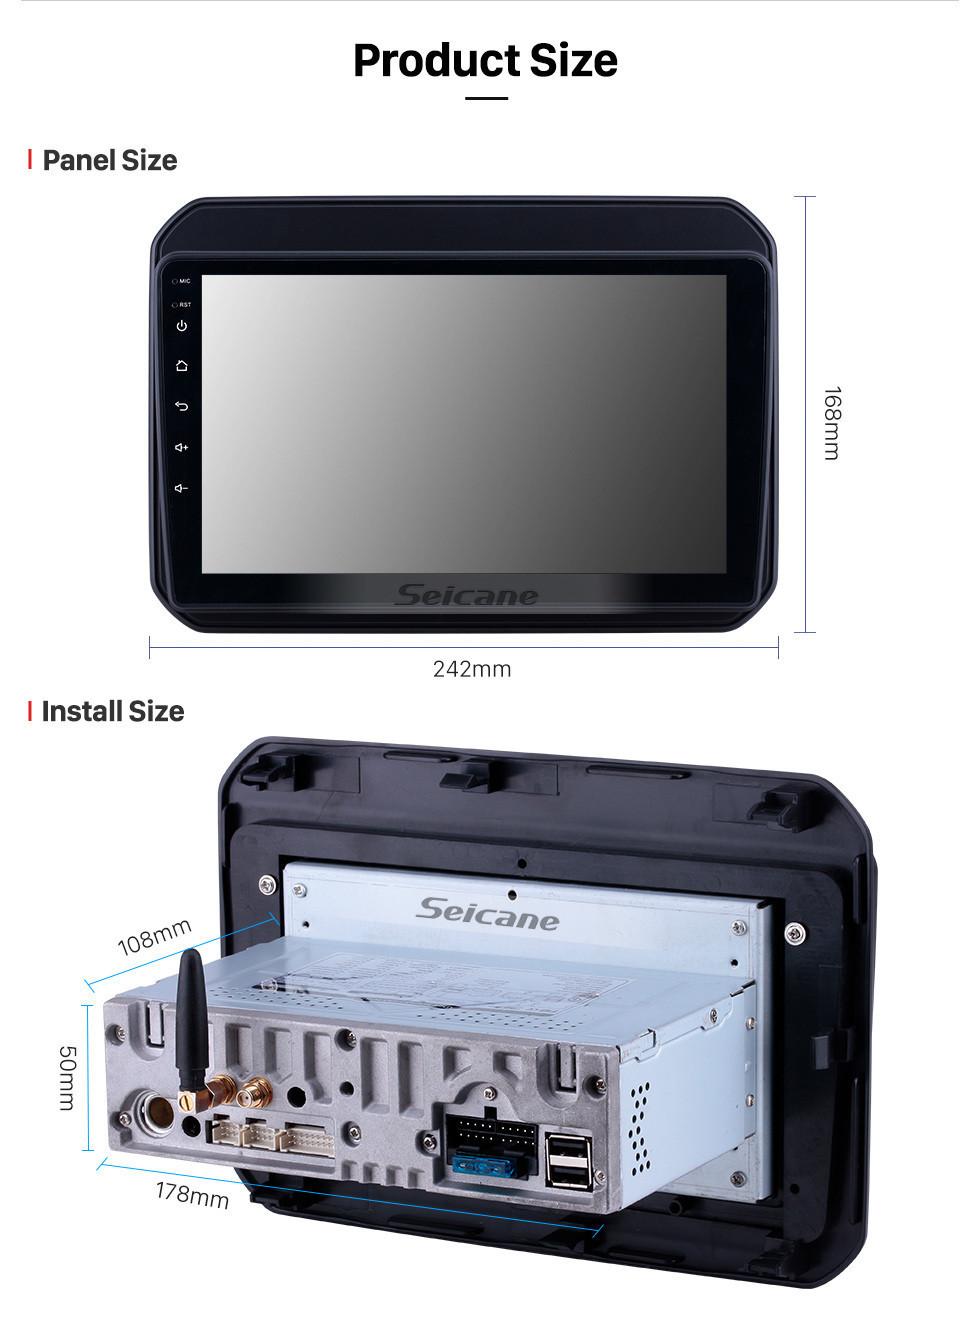 Seicane OEM 9 inch Android 10.0 Radio for 2016-2019 Suzuki Ignis Bluetooth Wifi HD Touchscreen GPS Navigation Carplay USB support OBD2 Digital TV TPMS DAB+